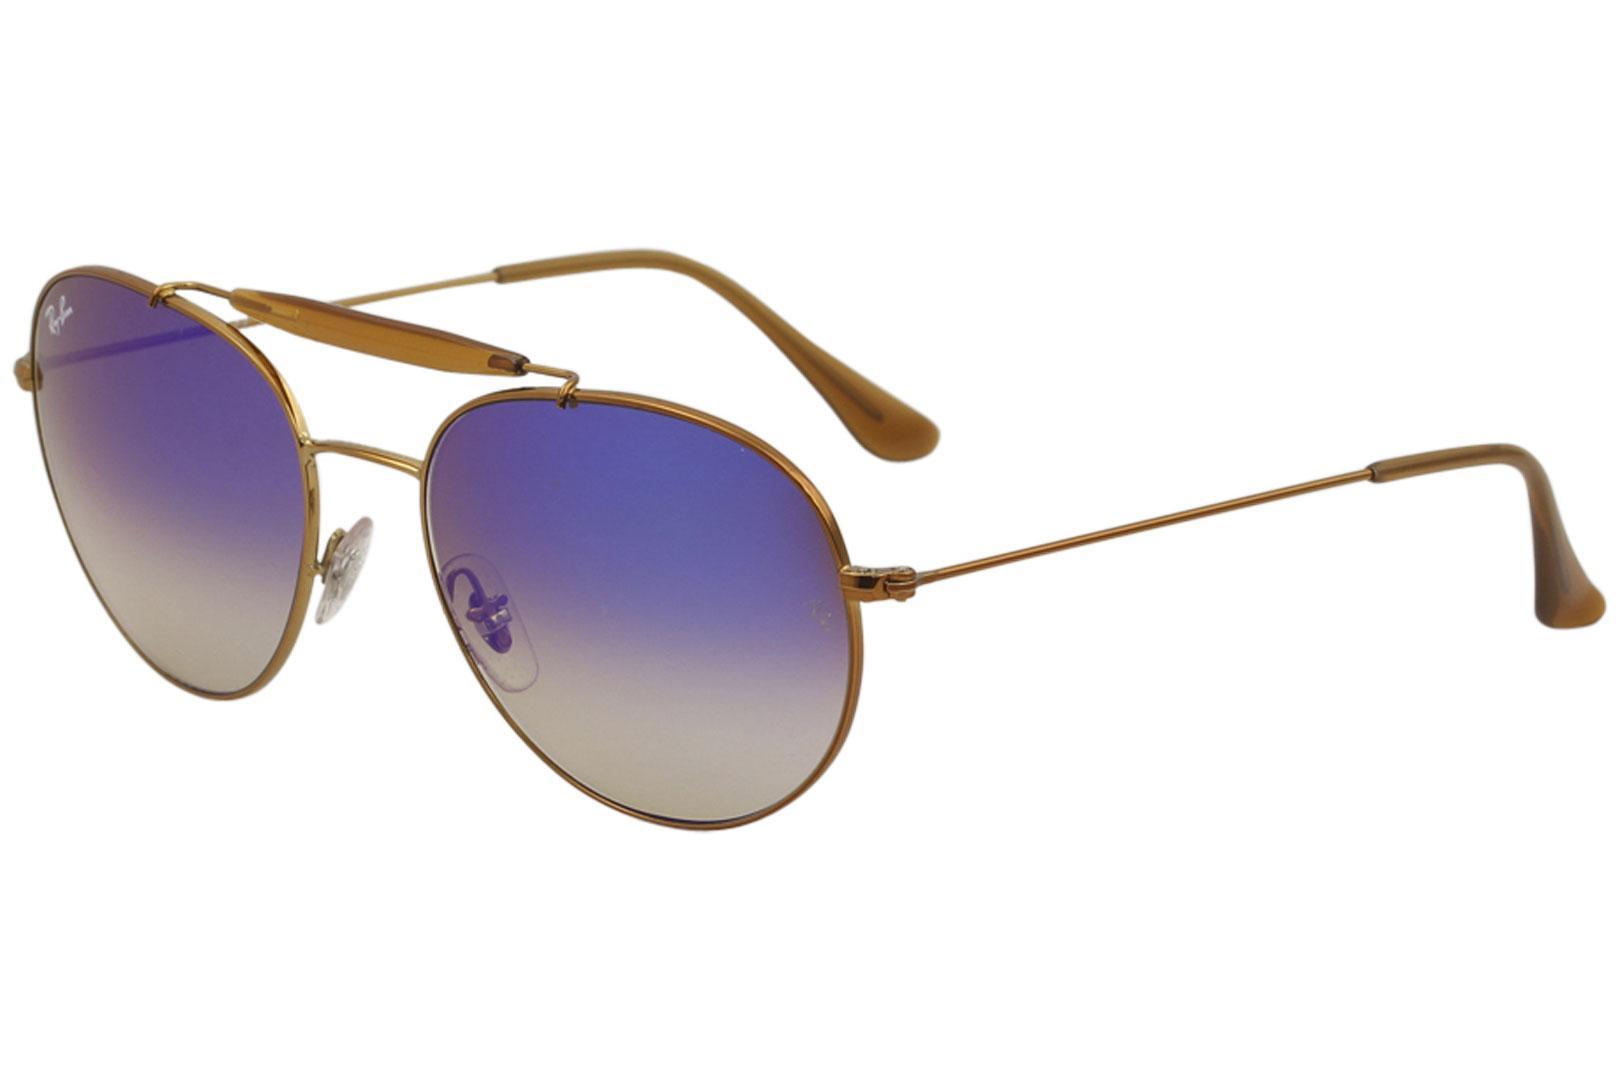 efc9658d3b5 Ray Ban Men s RB3540 RB 3540 RayBan Fashion Pilot Sunglasses